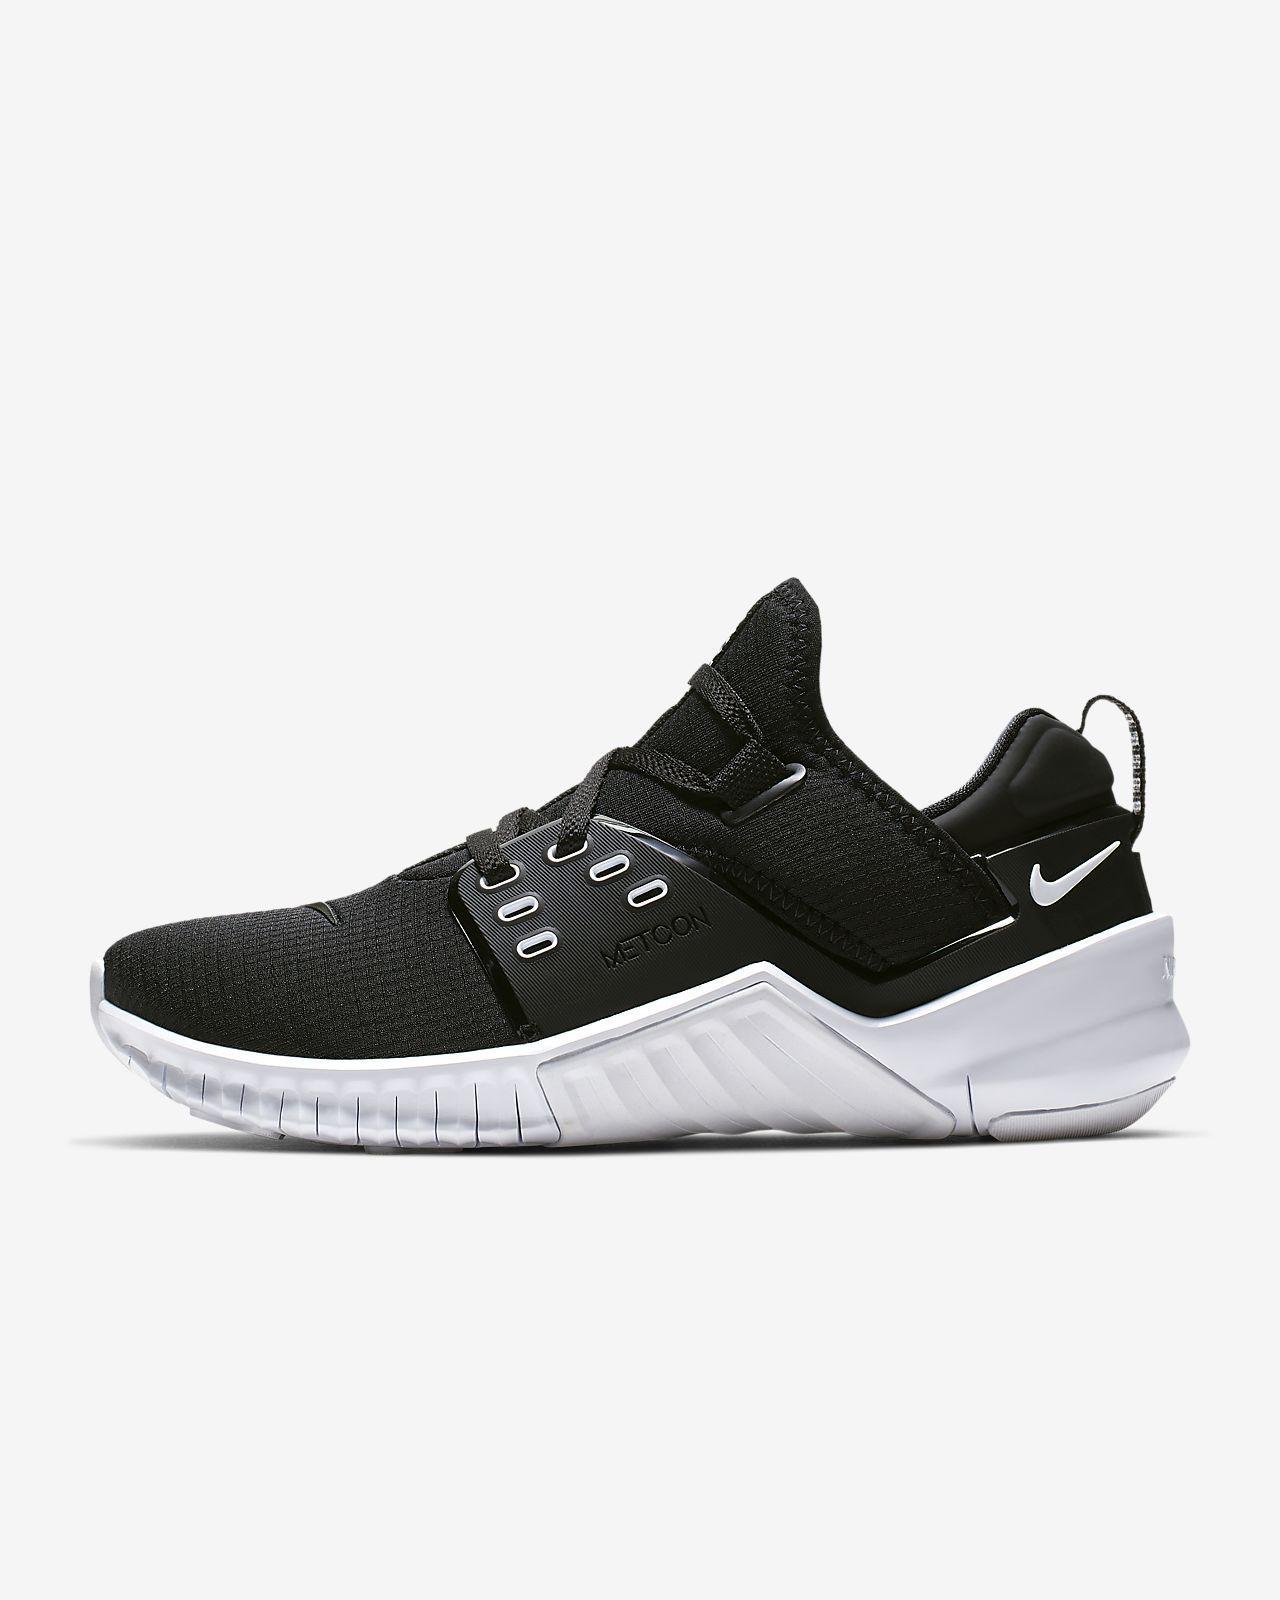 Nike - Giày tập luyện nữ Nữ WMNS NIKE FREE METCON 2